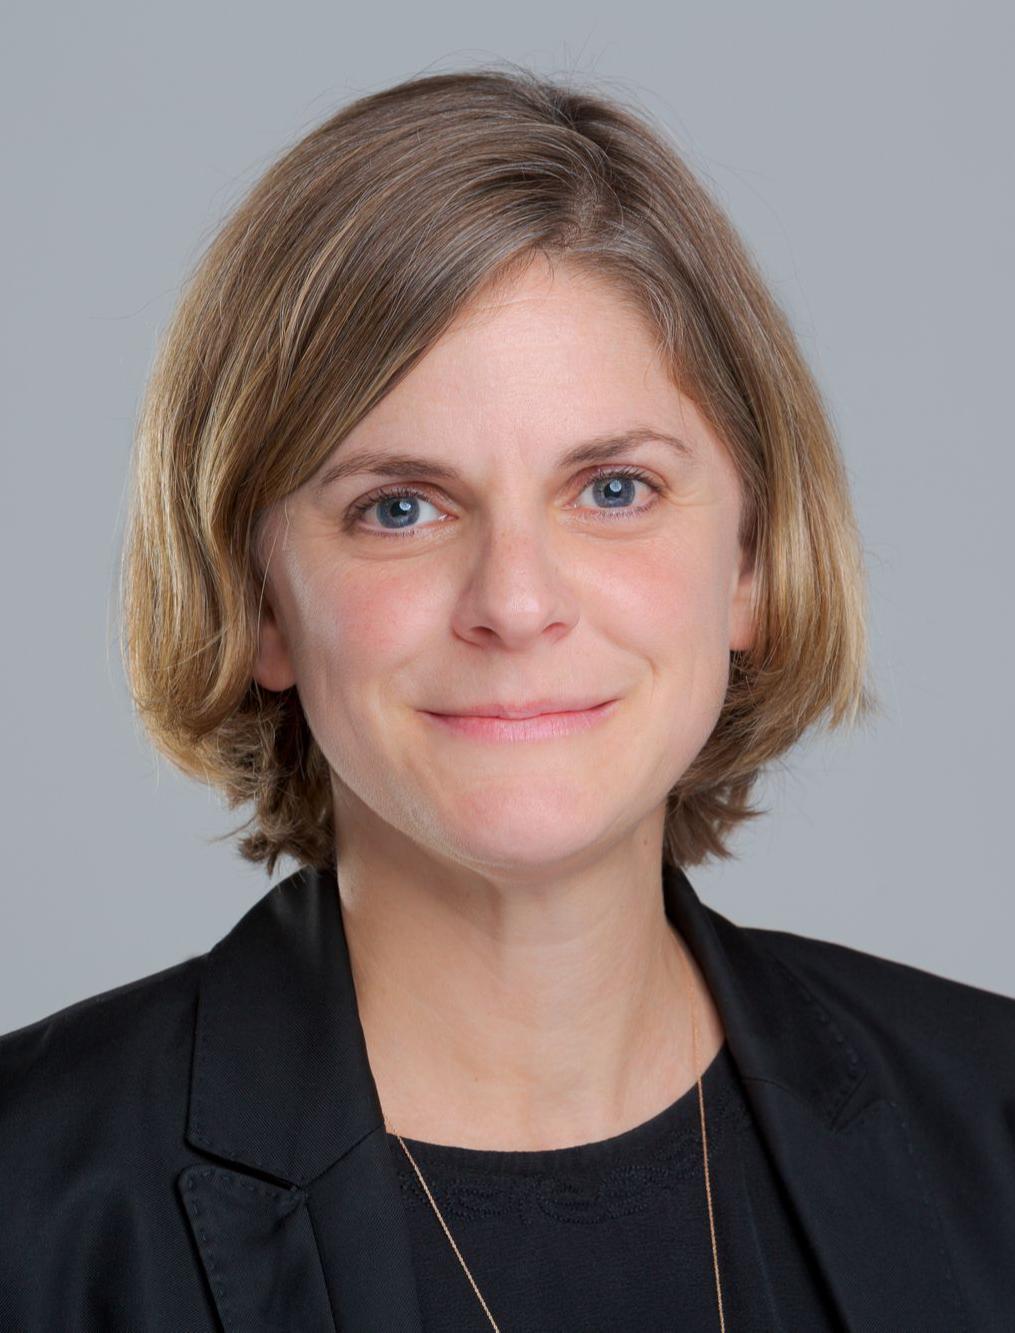 Maître Christine LICHTENBERGER Avocat Paris